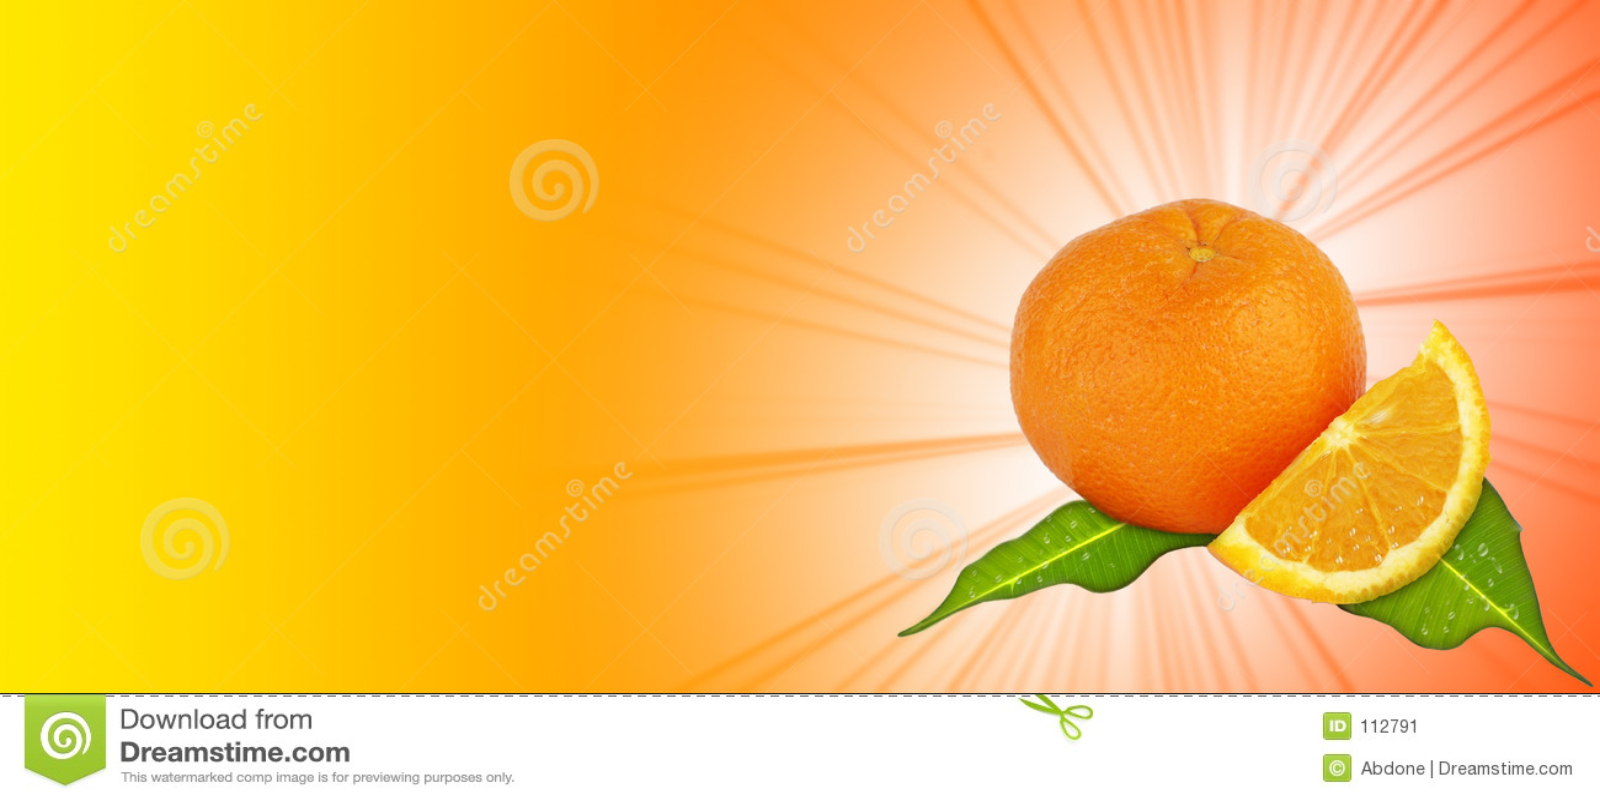 Anaranjado fondo amarillo naranja imagen de archivo - Amarillo naranja ...